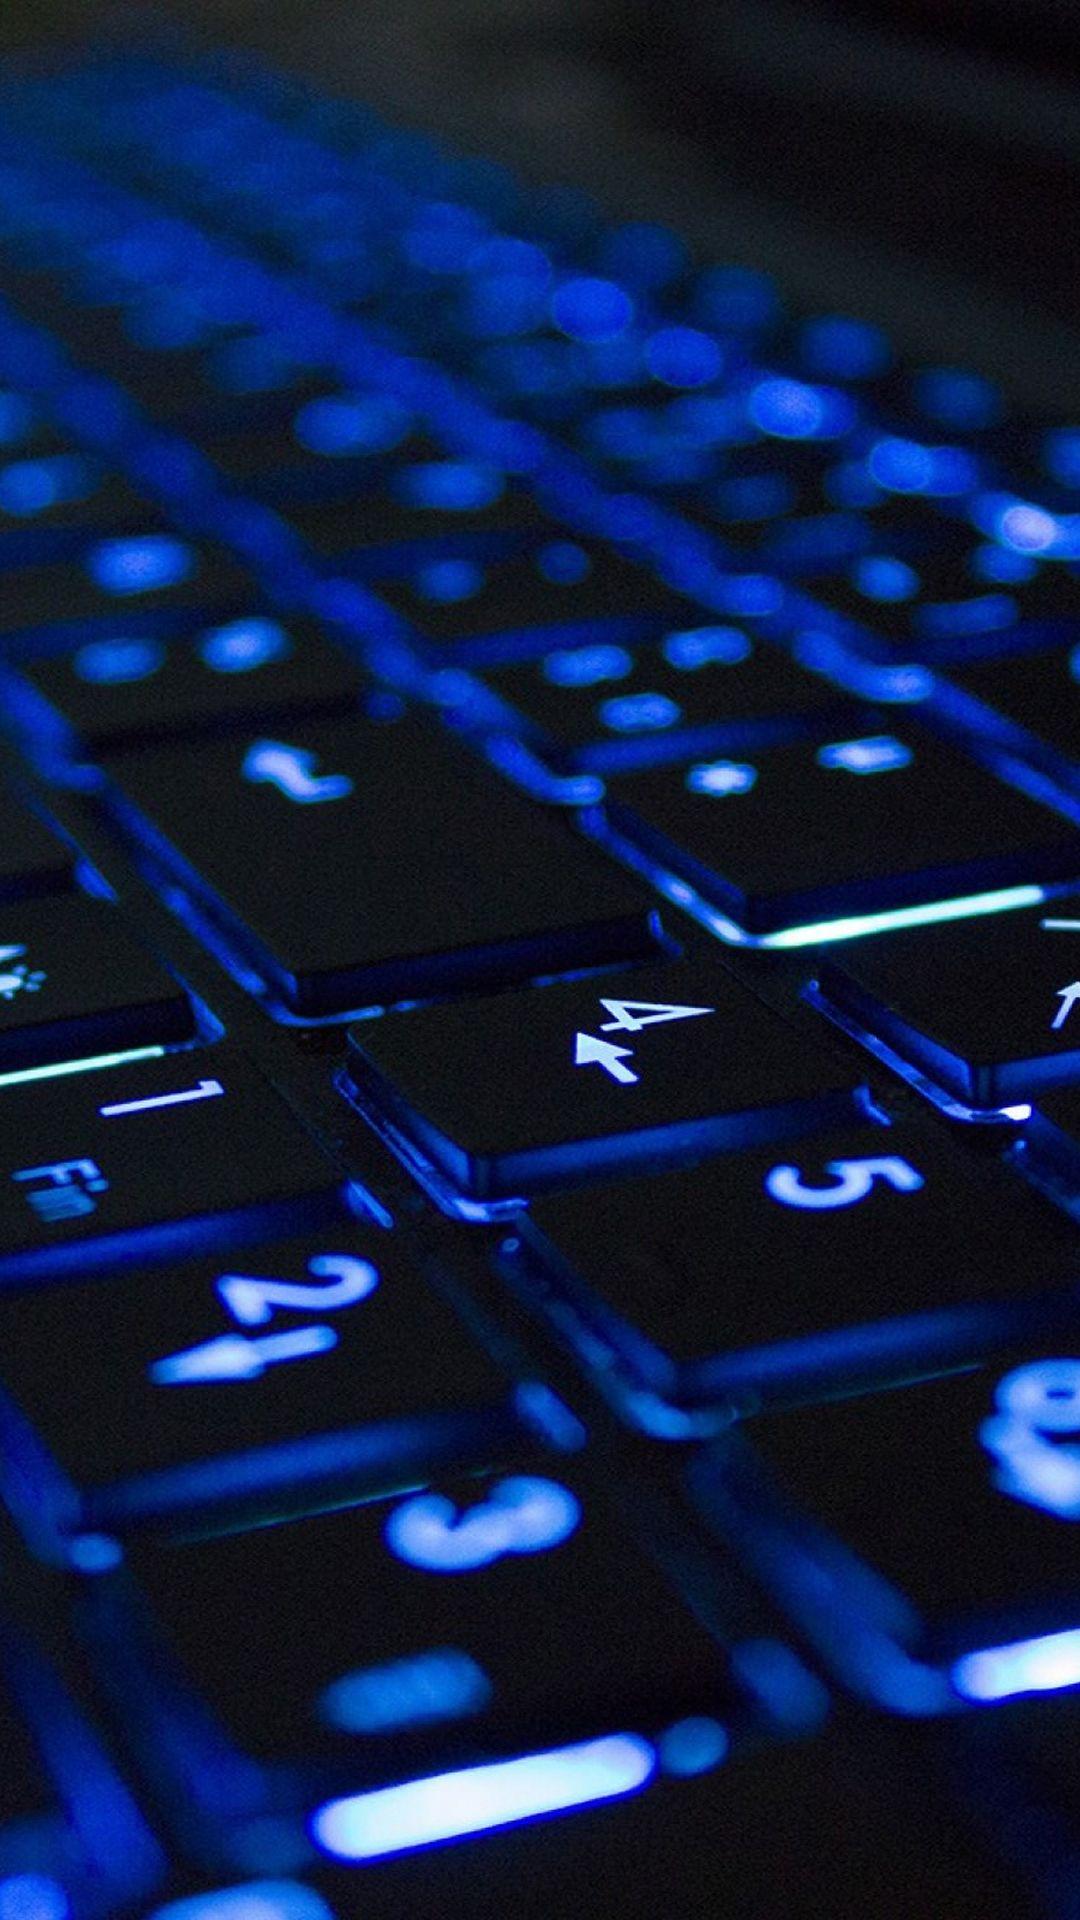 Blue Neon Illuminated Computer Keyboard Iphone 6 Plus Wallpaper Wallpaper Iphone Neon Computer Keyboard Hi Tech Wallpaper